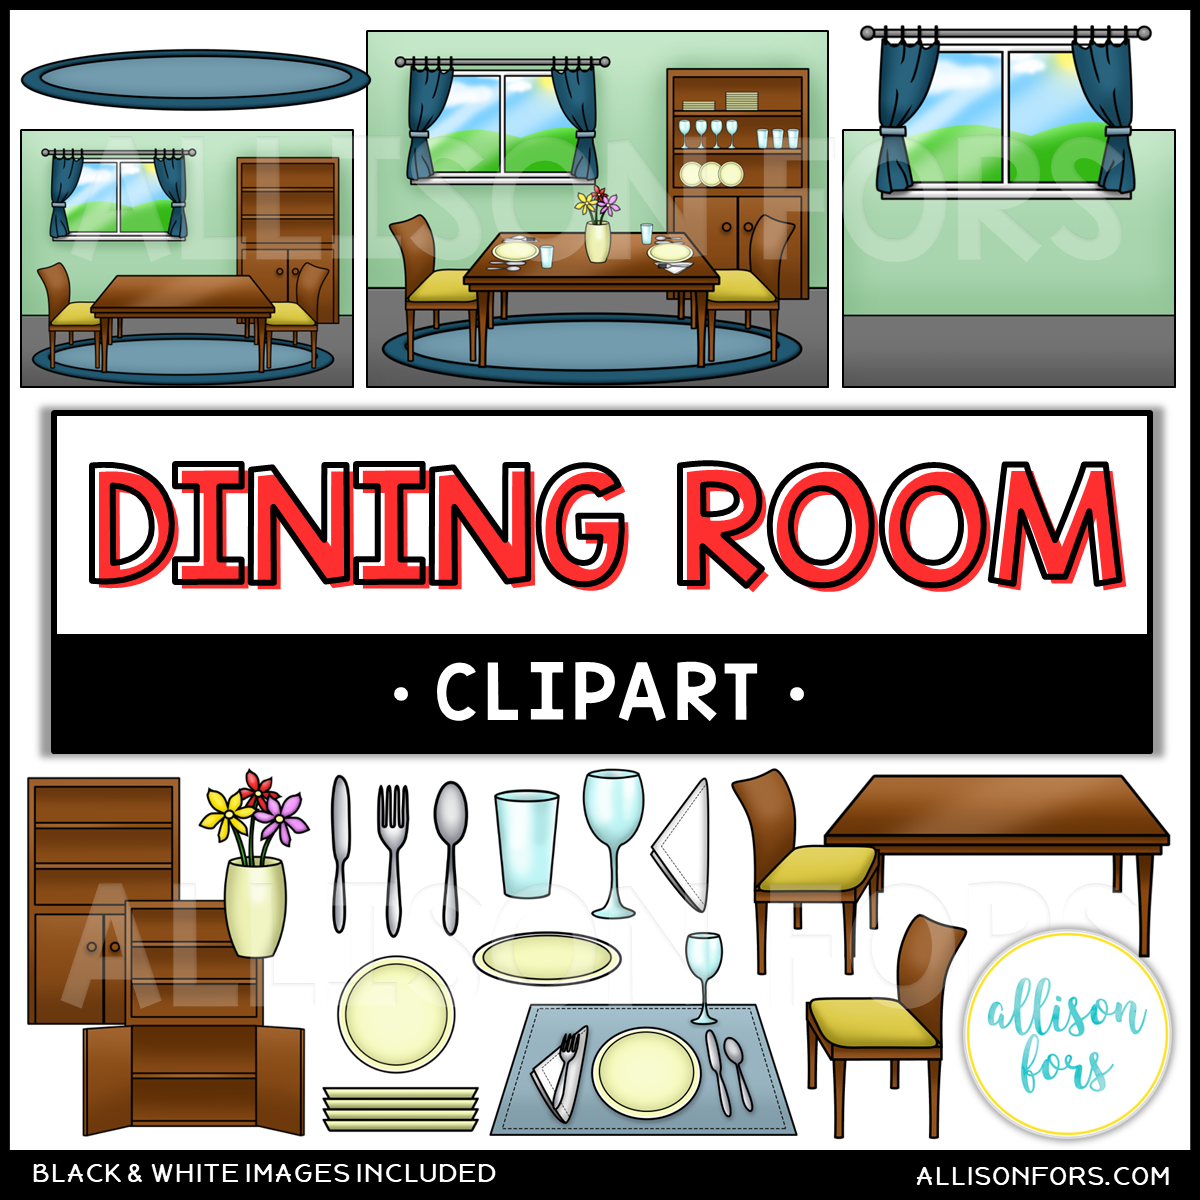 House Dining Room Clip Art Allison Fors Functional Life Skills Clip Art Dining Room